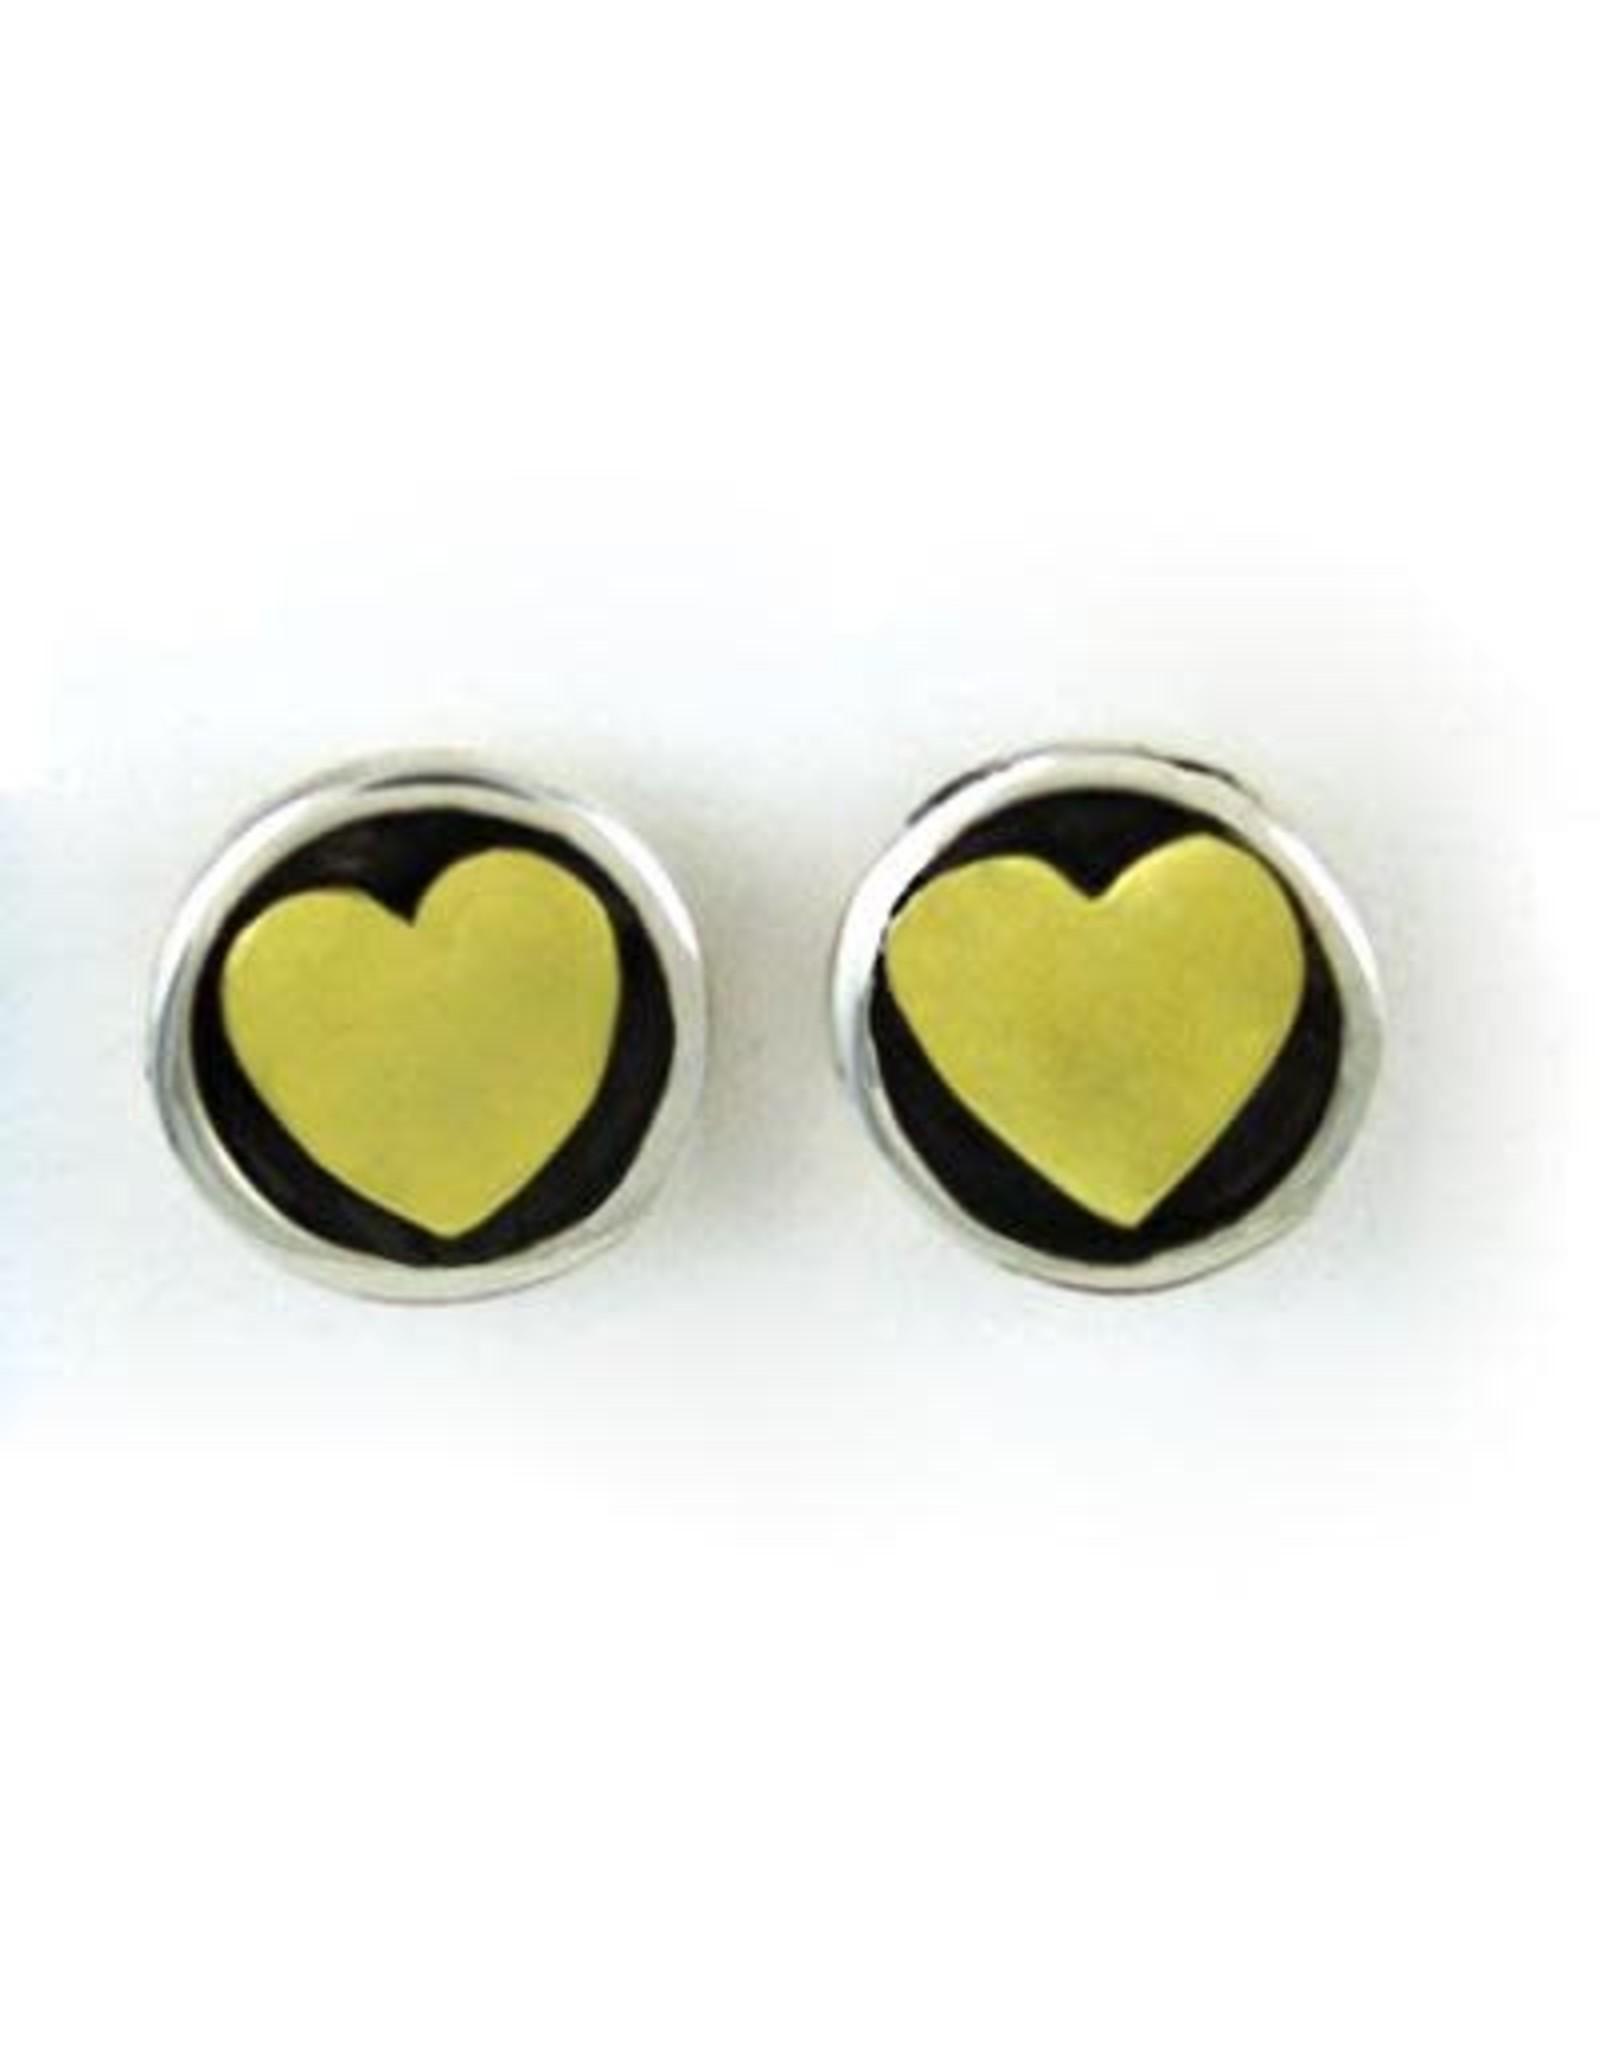 Heart Sterling and Brass Stud Earrings